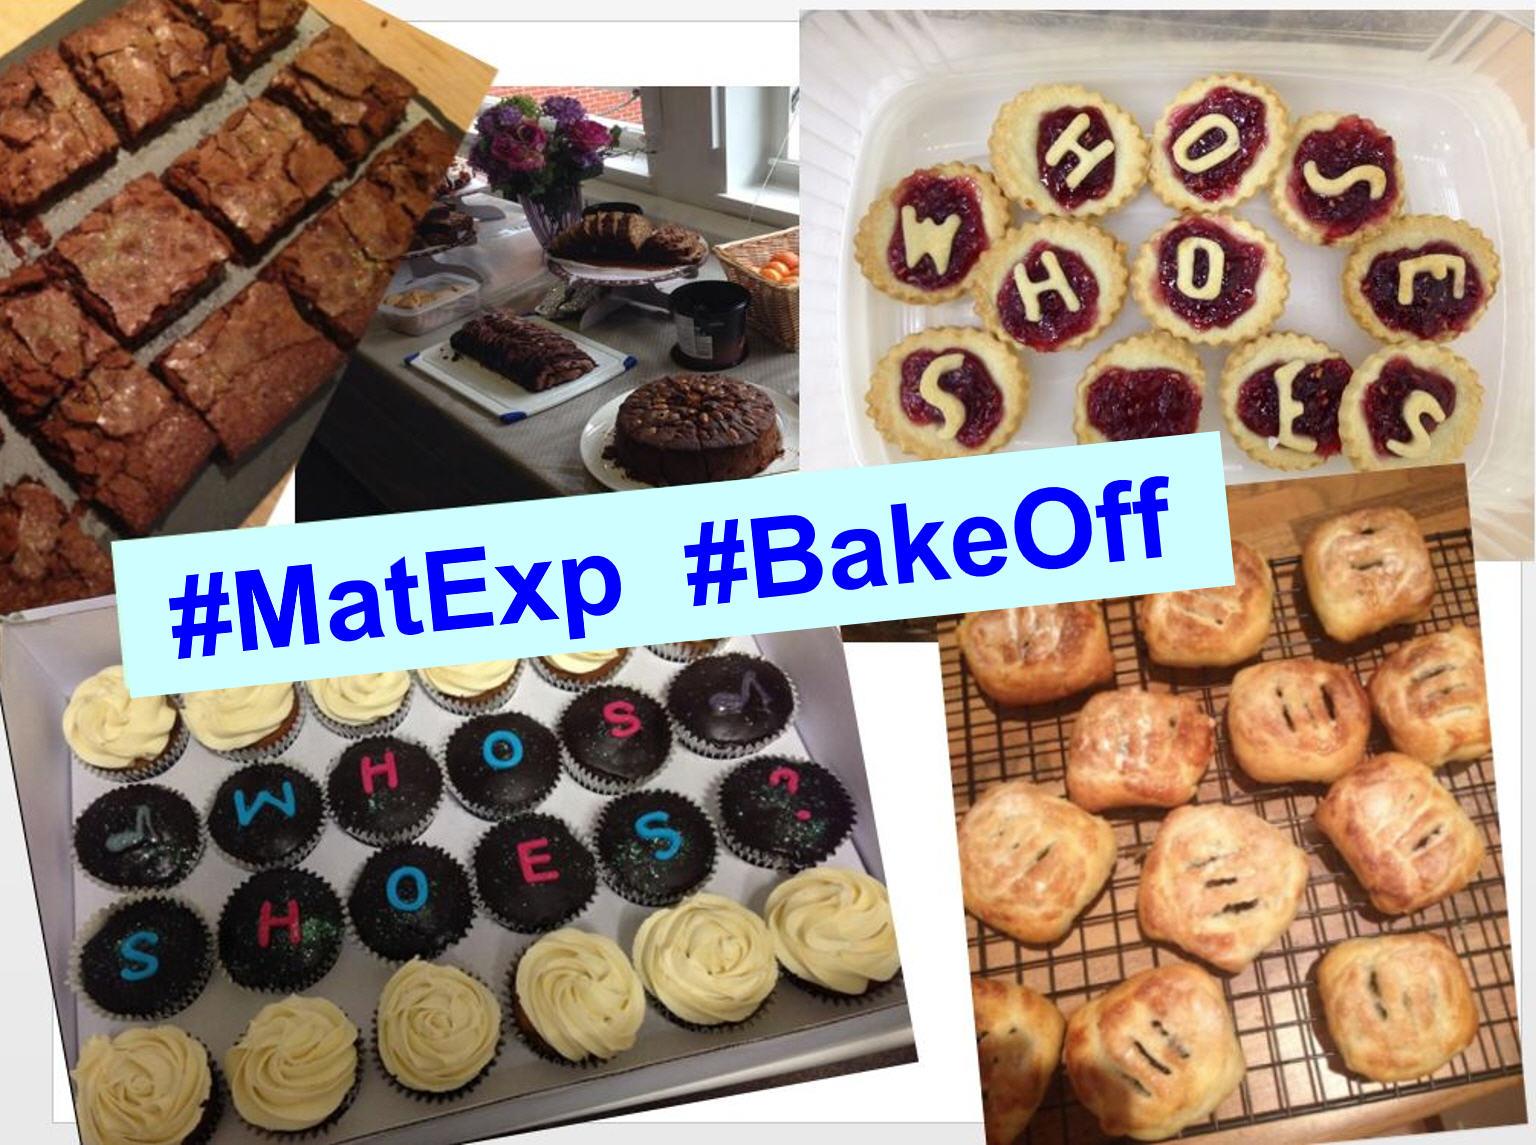 #MatExp bakeoff – Copy